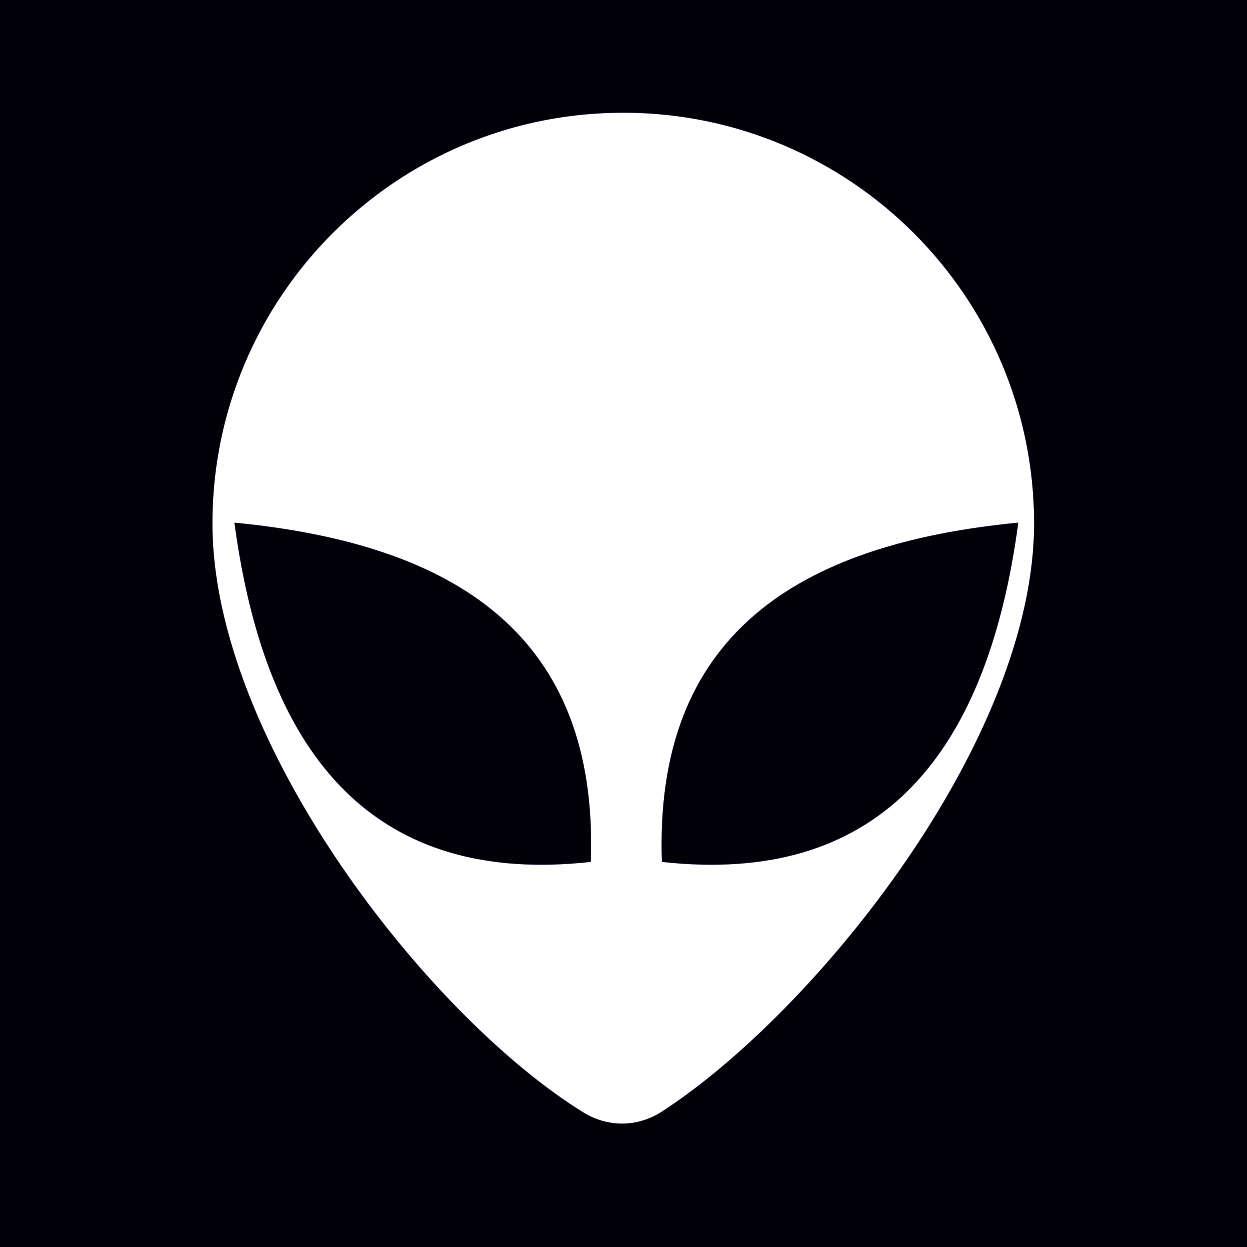 Alien svg #9, Download drawings